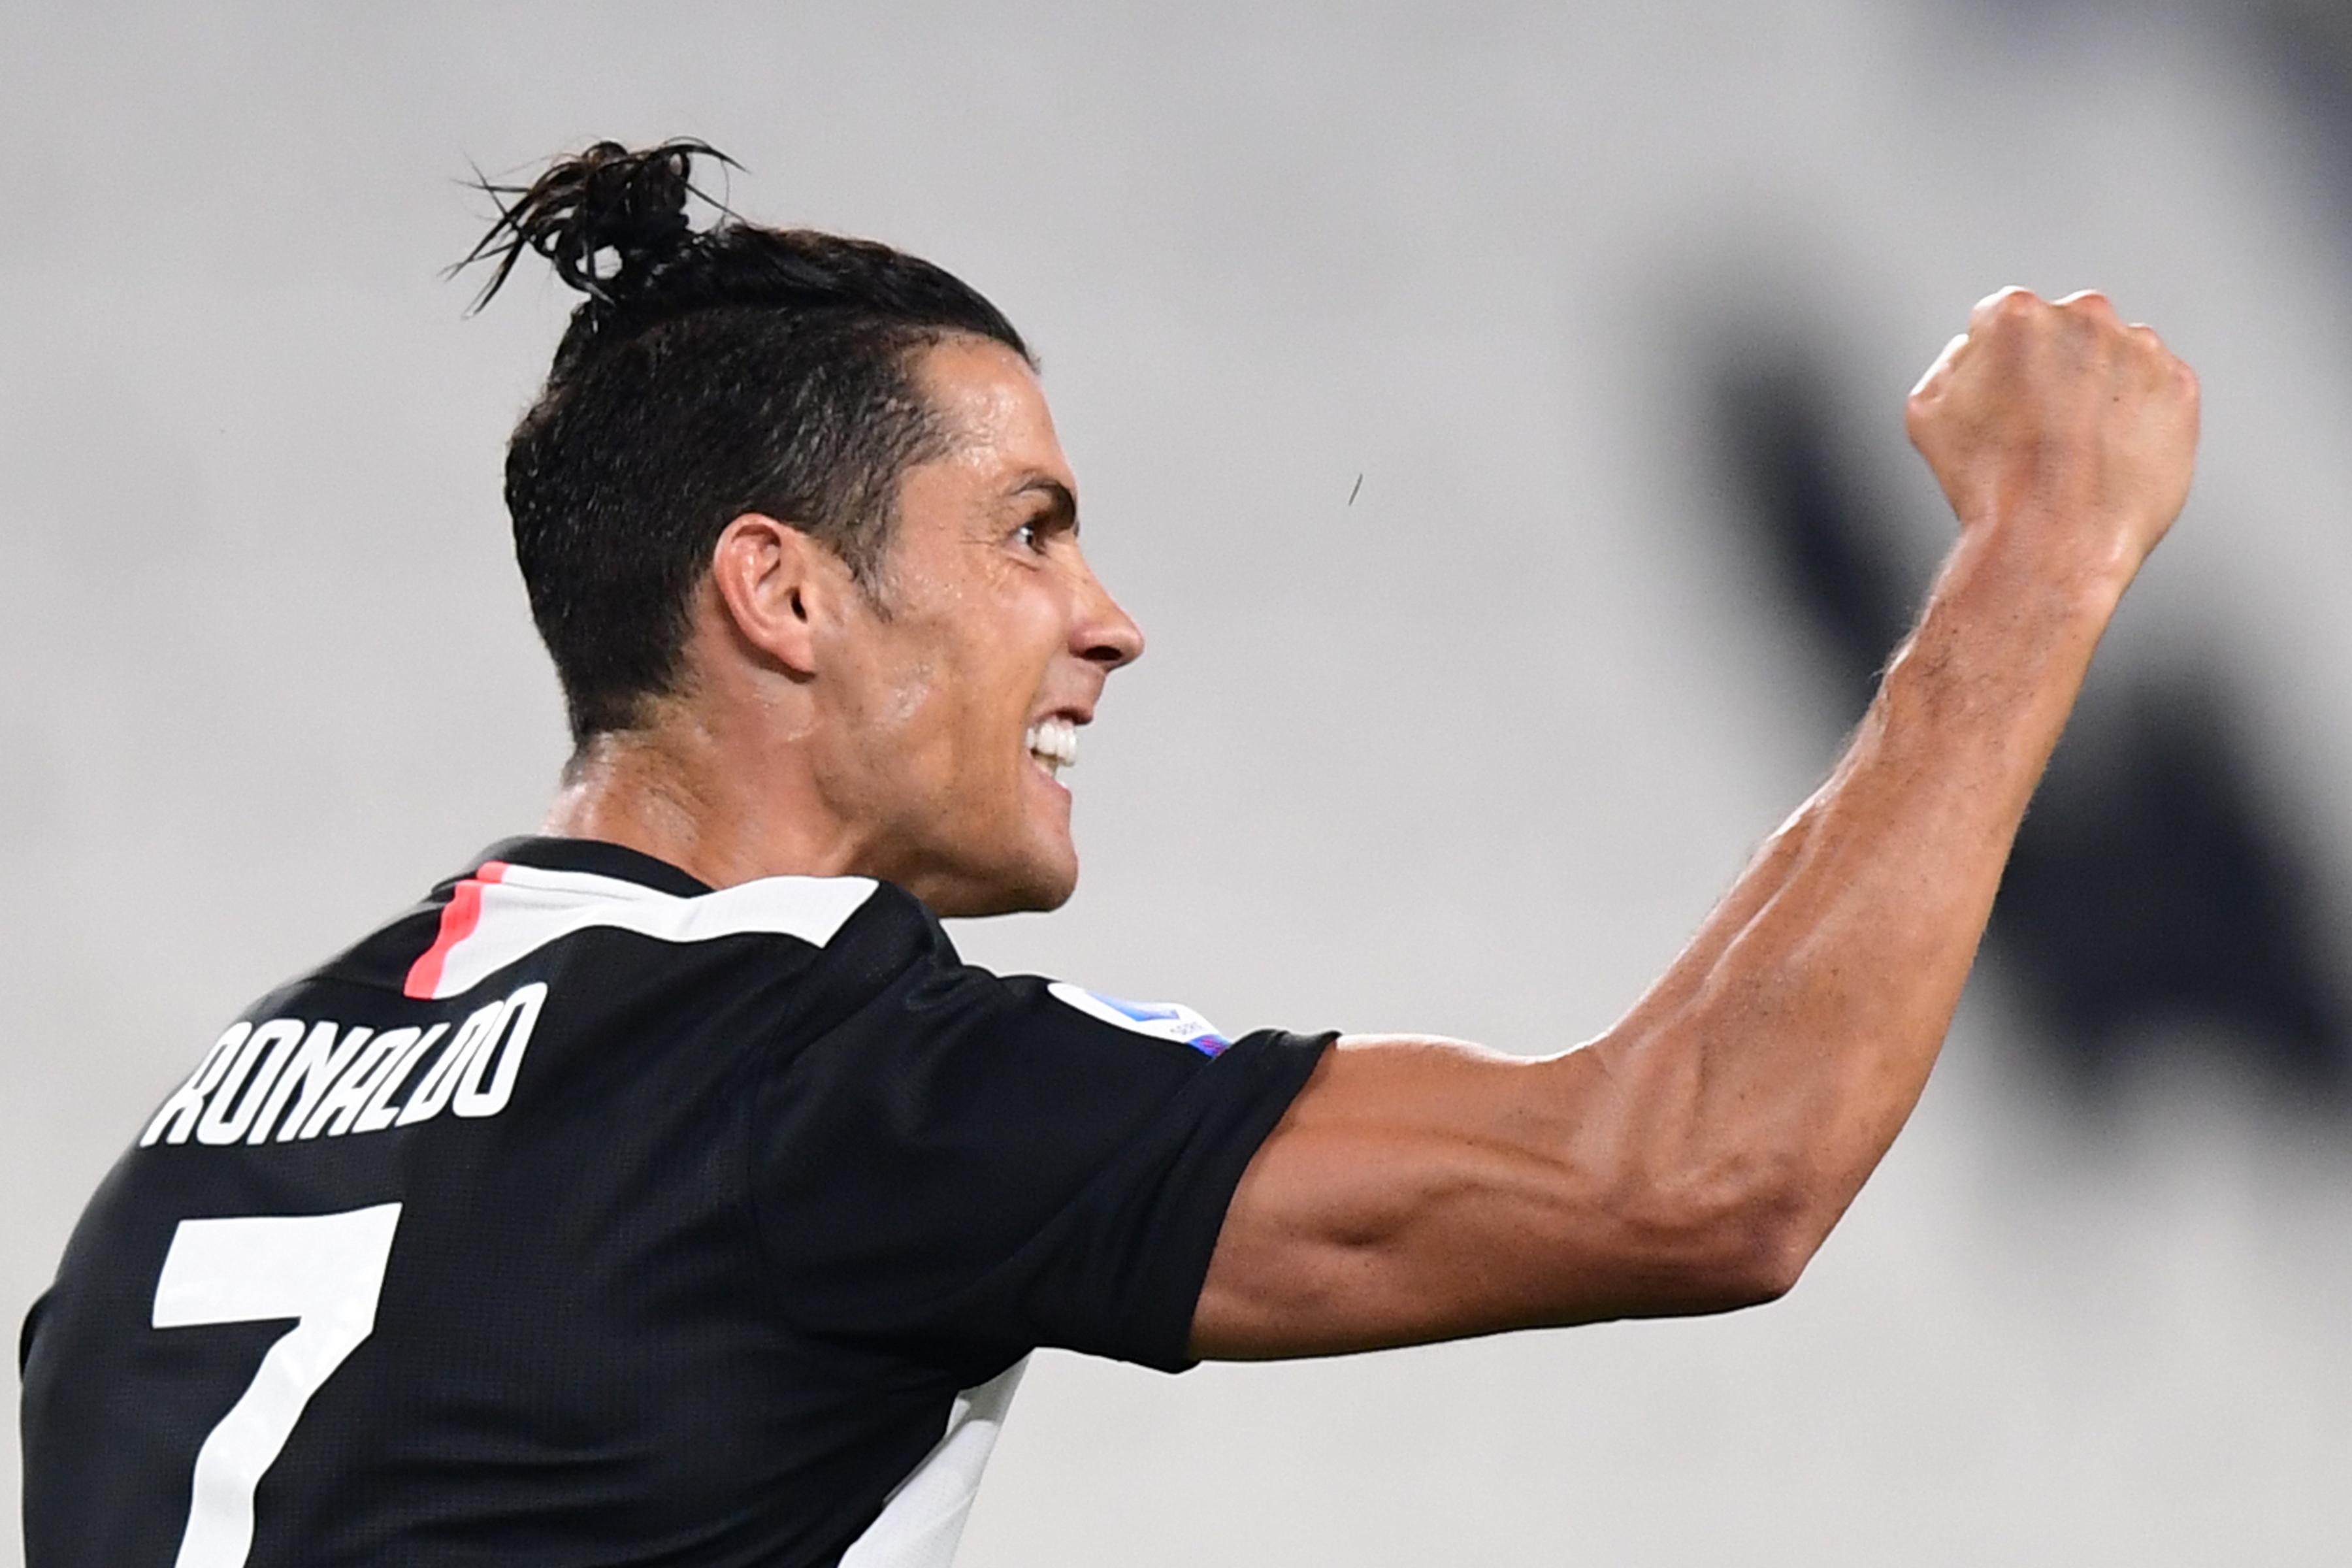 C罗意甲面对21支球队攻破20支球队大门,仅面对切沃未进